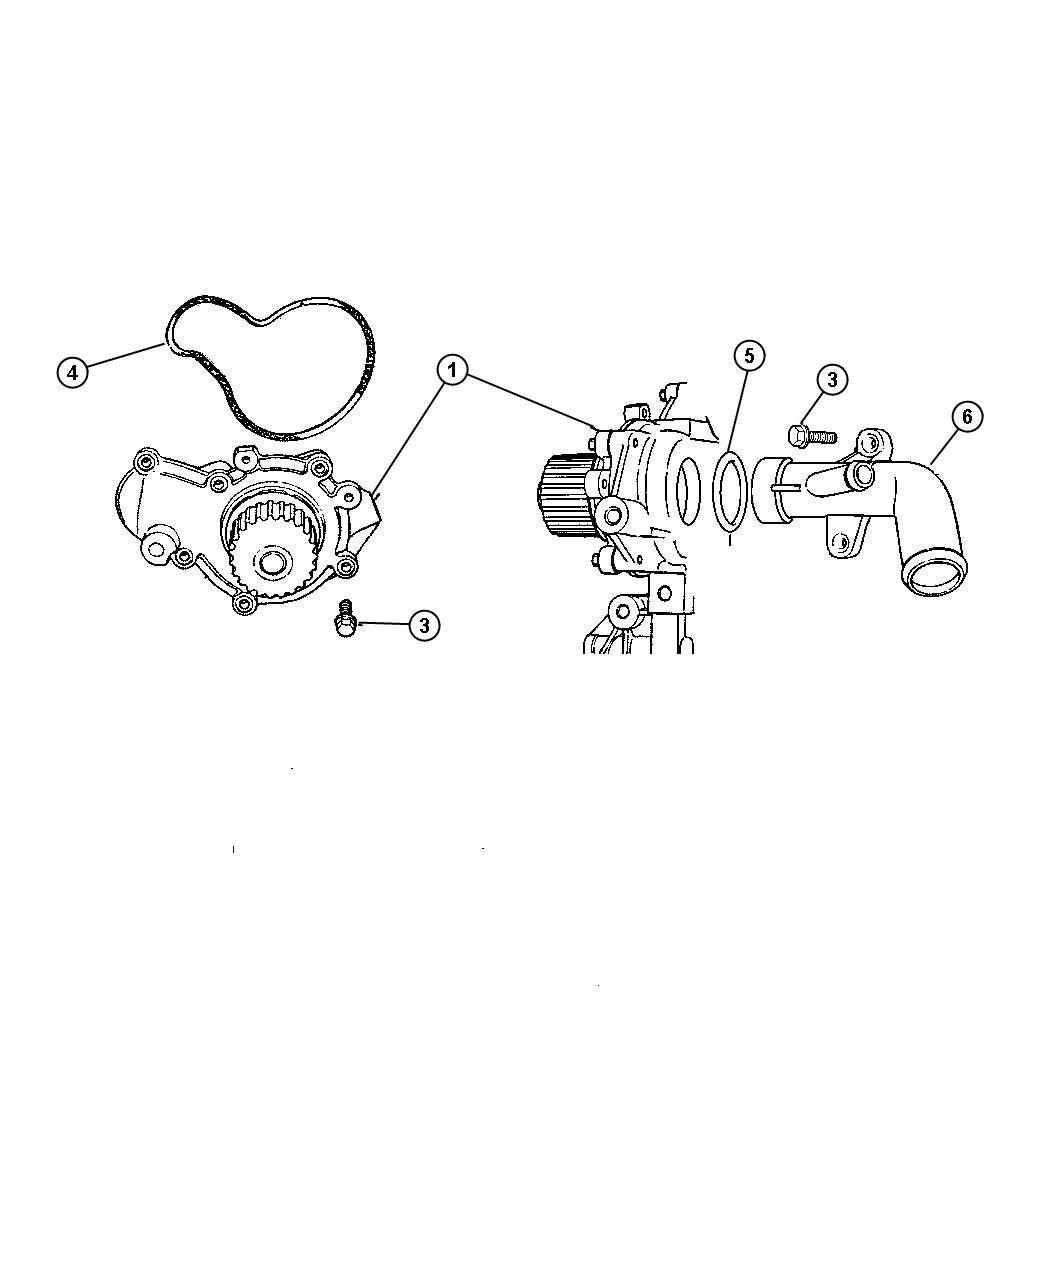 Dodge Stratus Se Sedan Water Pump And Related Parts